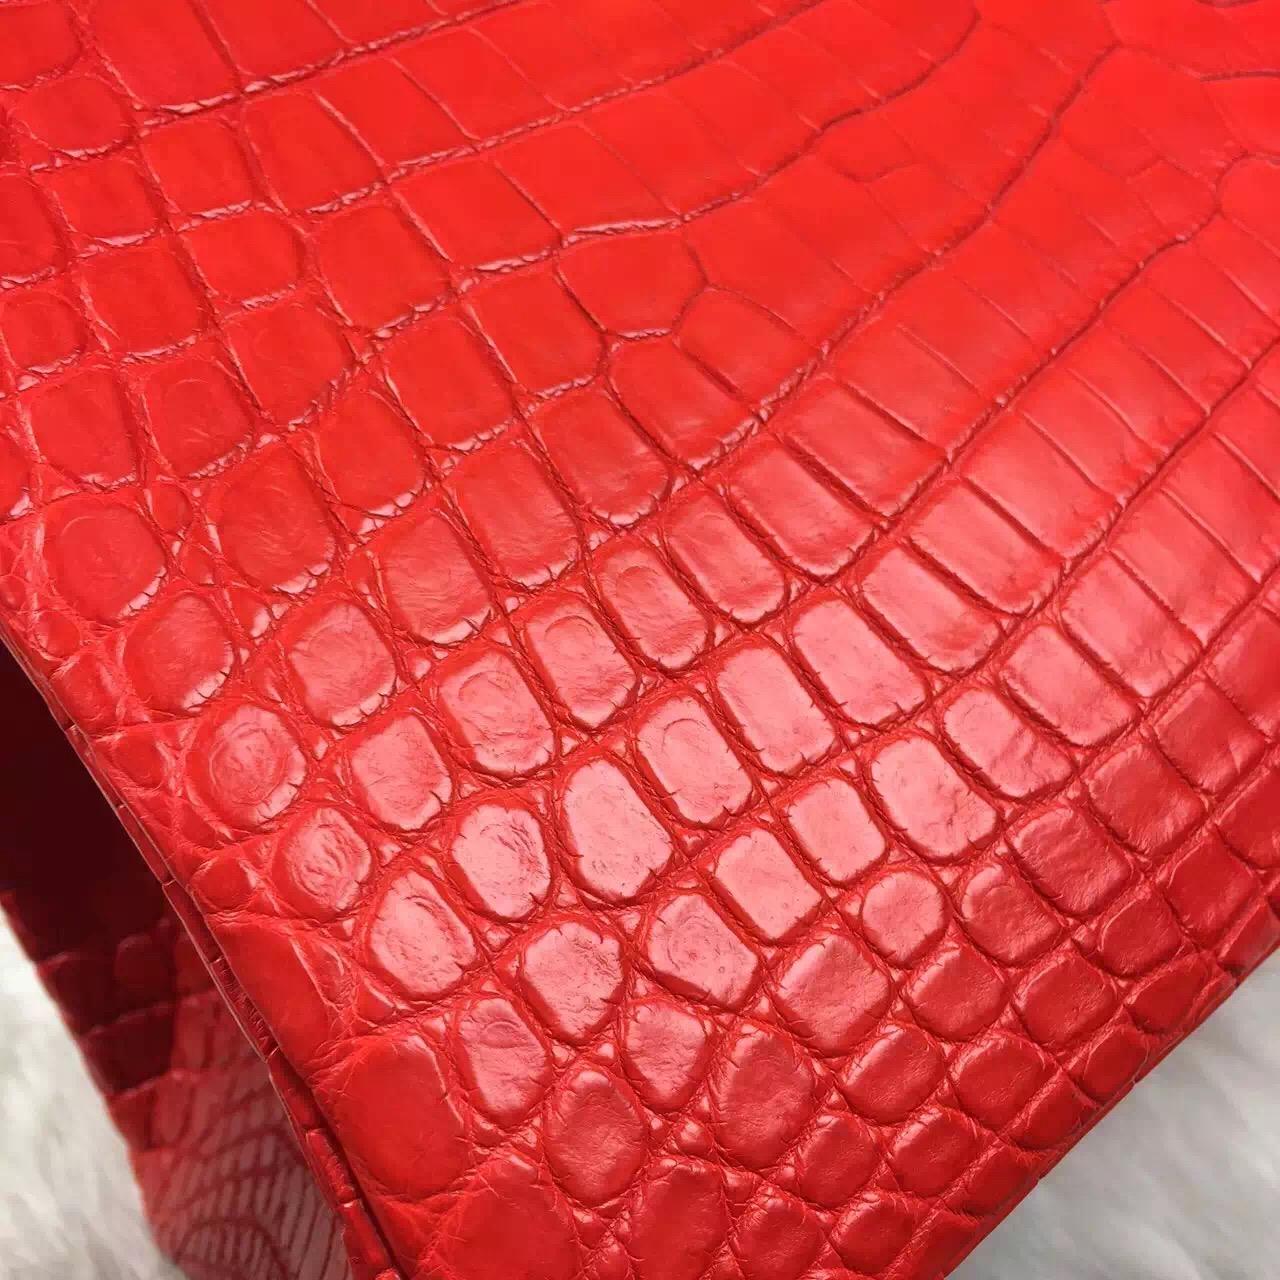 Hand Stitching Hermes Cuckoo Red Birkin35 Crocodile Matt Leather